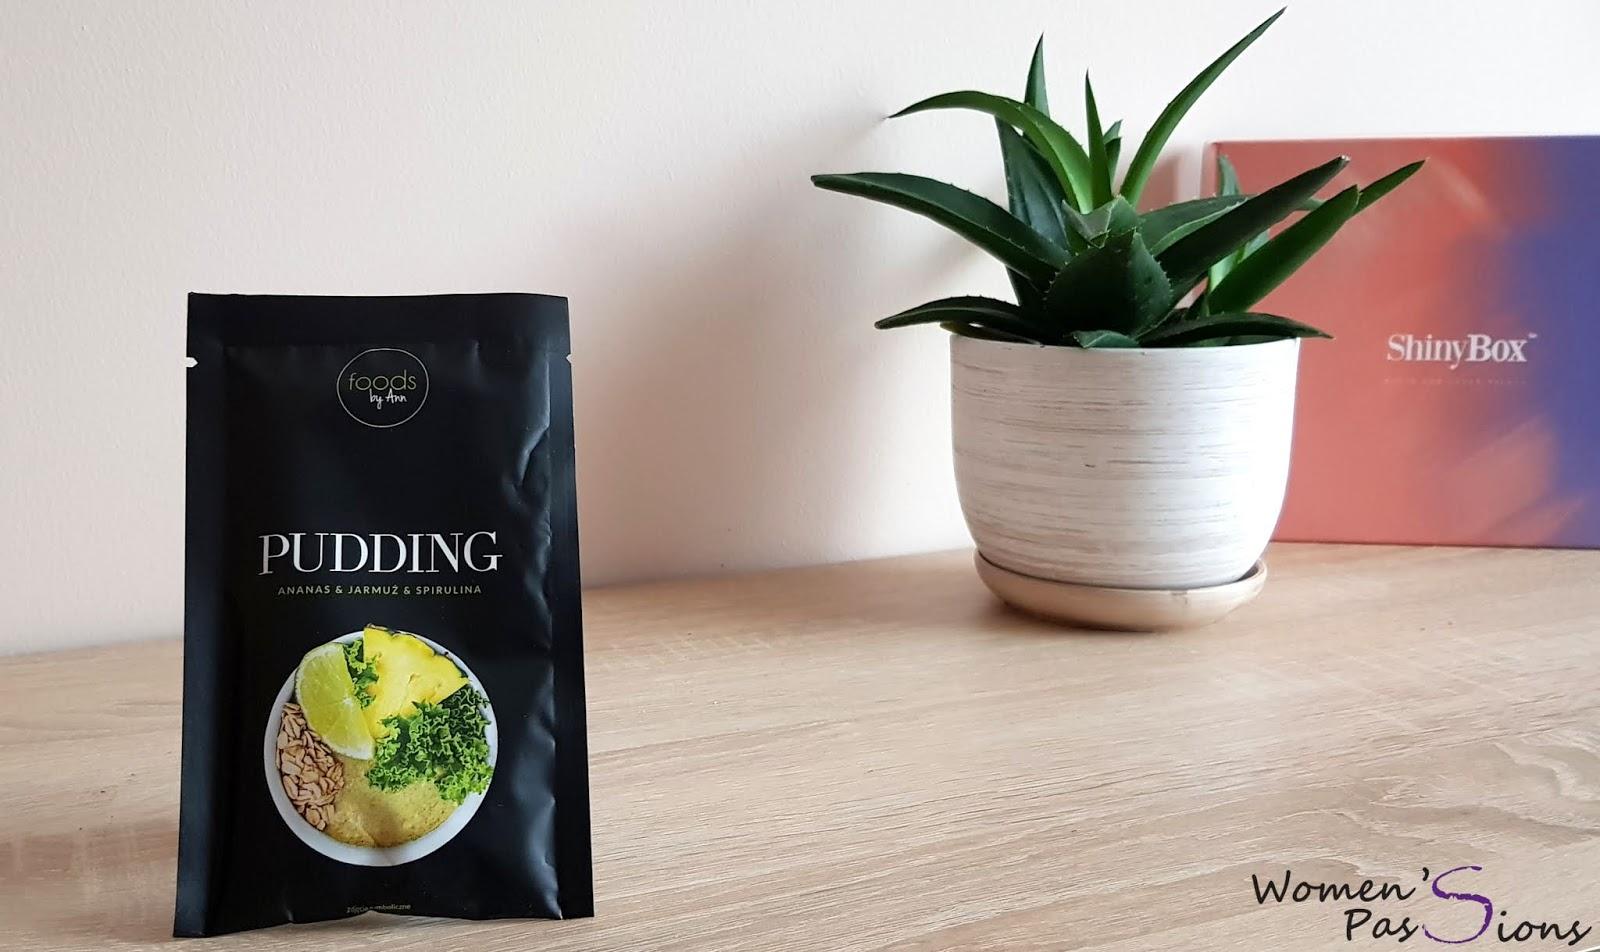 Foods by Ann Pudding - Ananas, Jarmuż i Spirulina